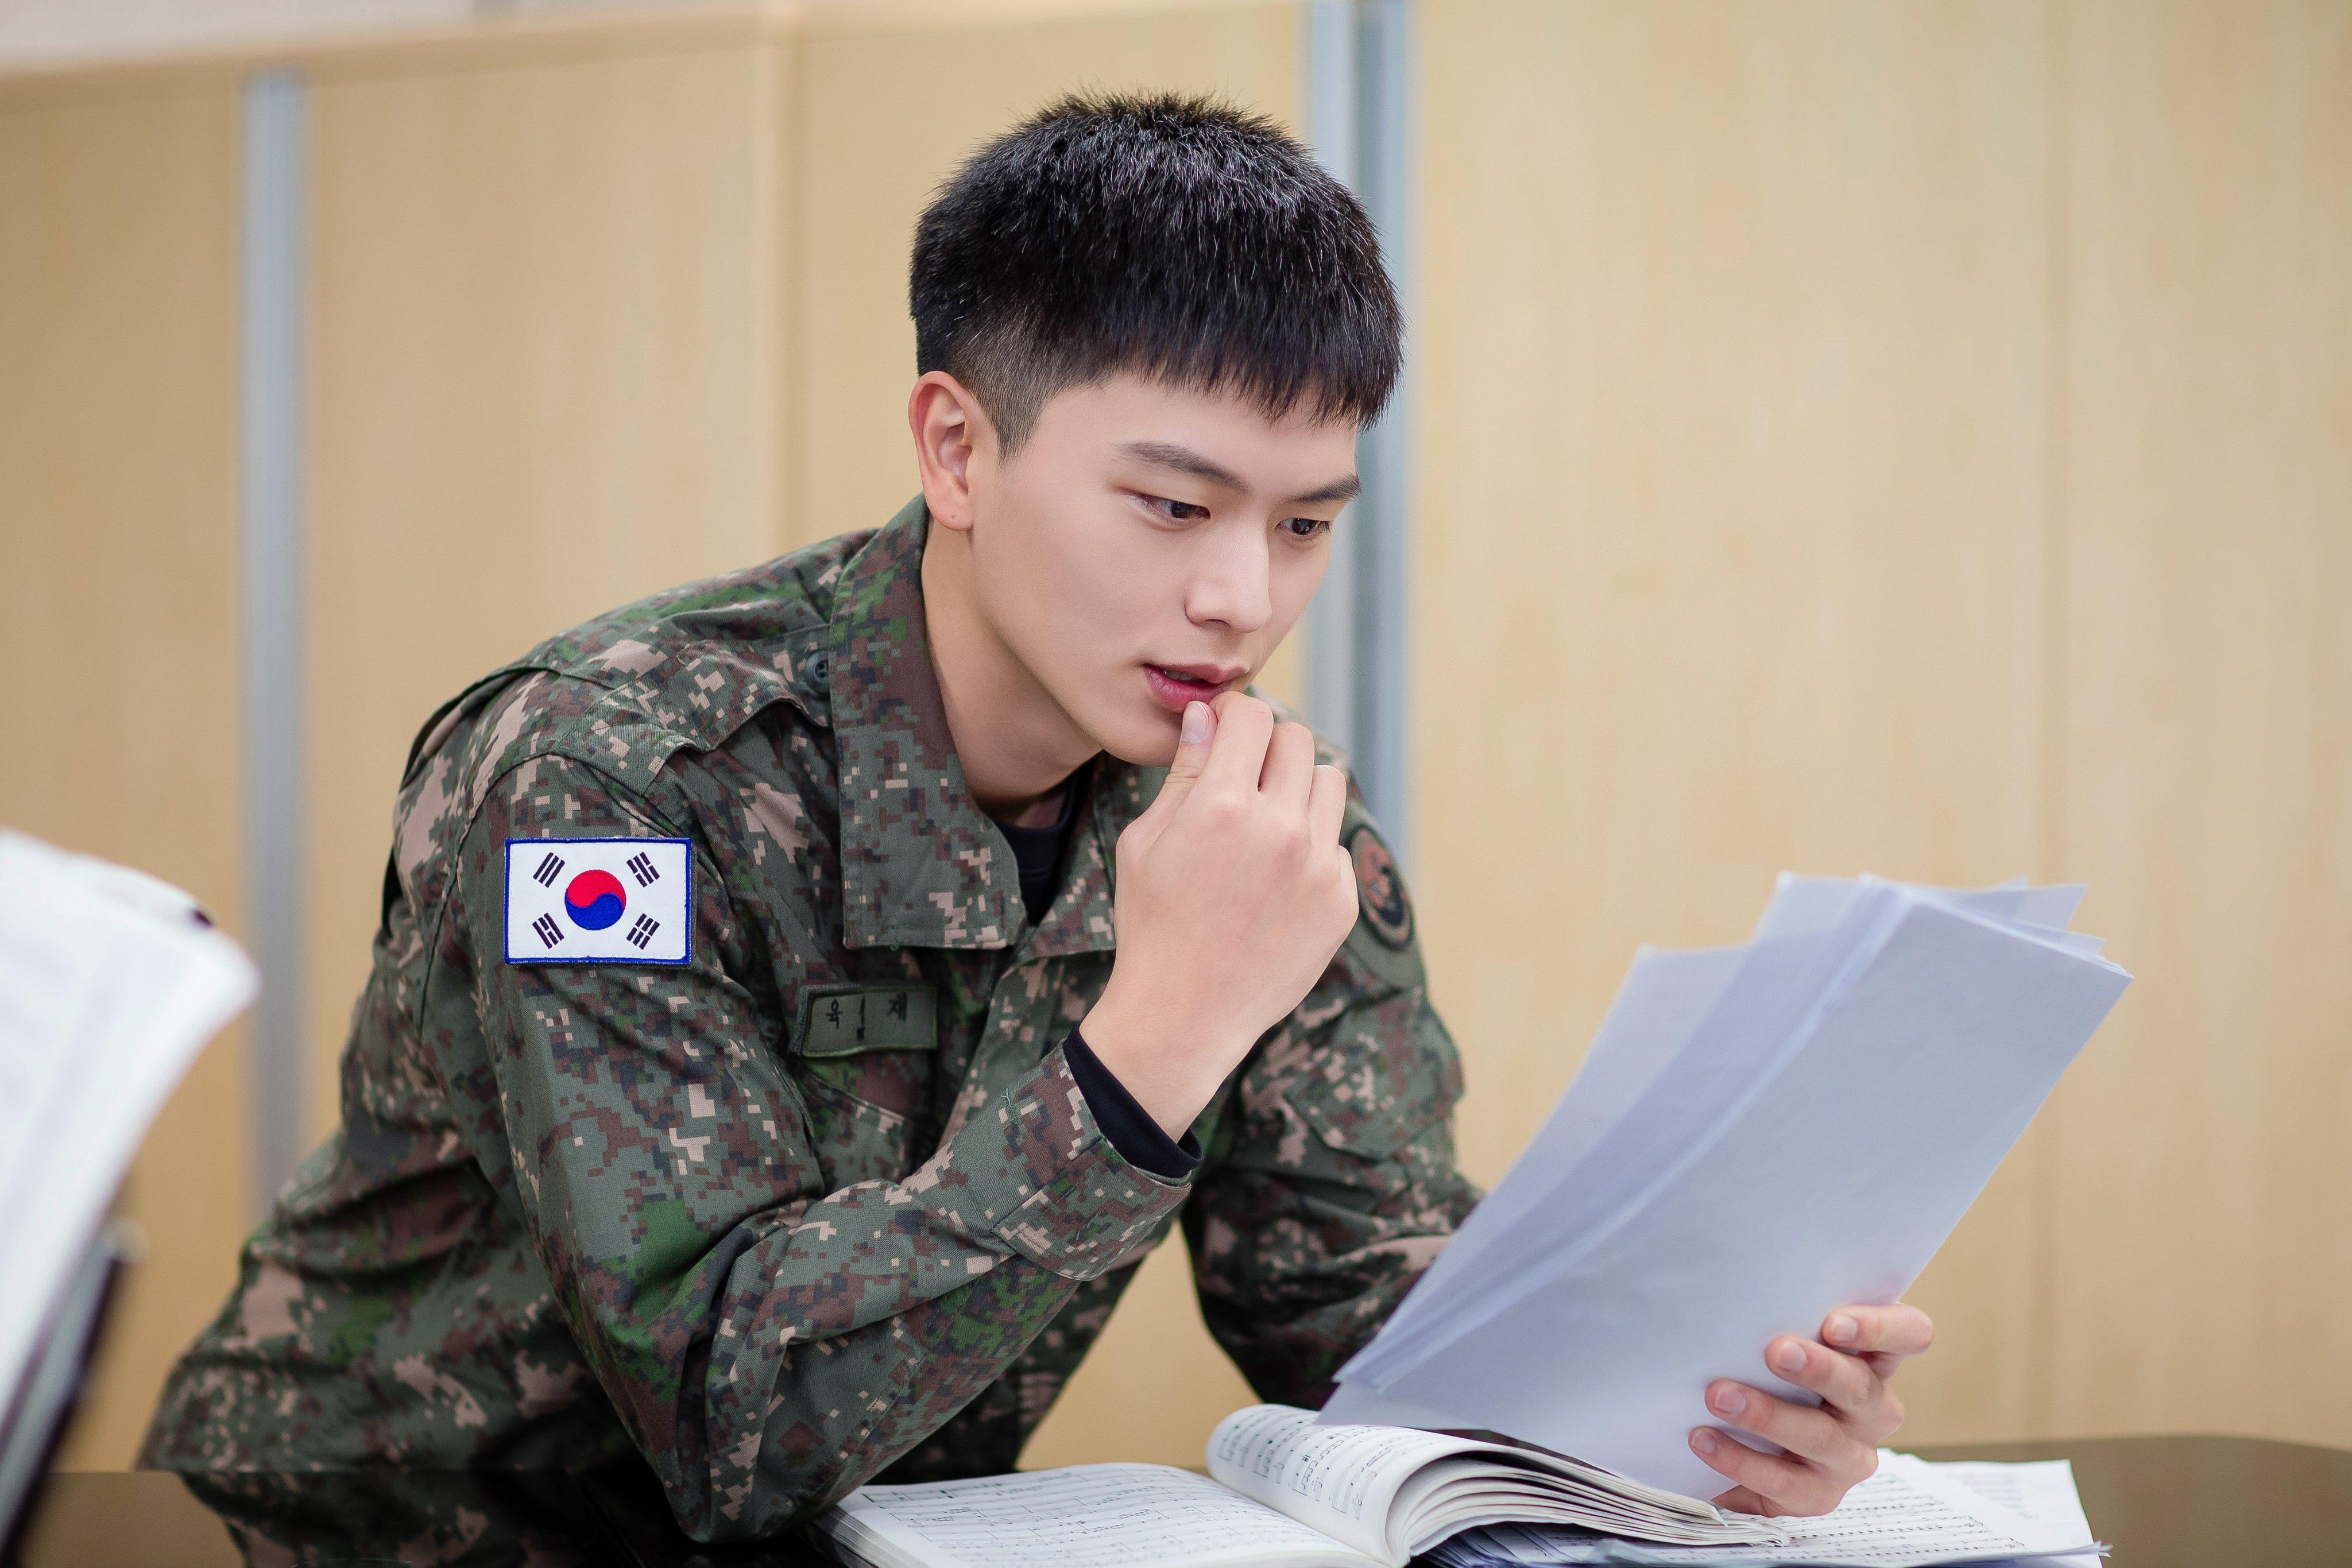 Military Reveals New Photos Of EXO's D.O. And BTOB's Yook Sungjae | Soompi